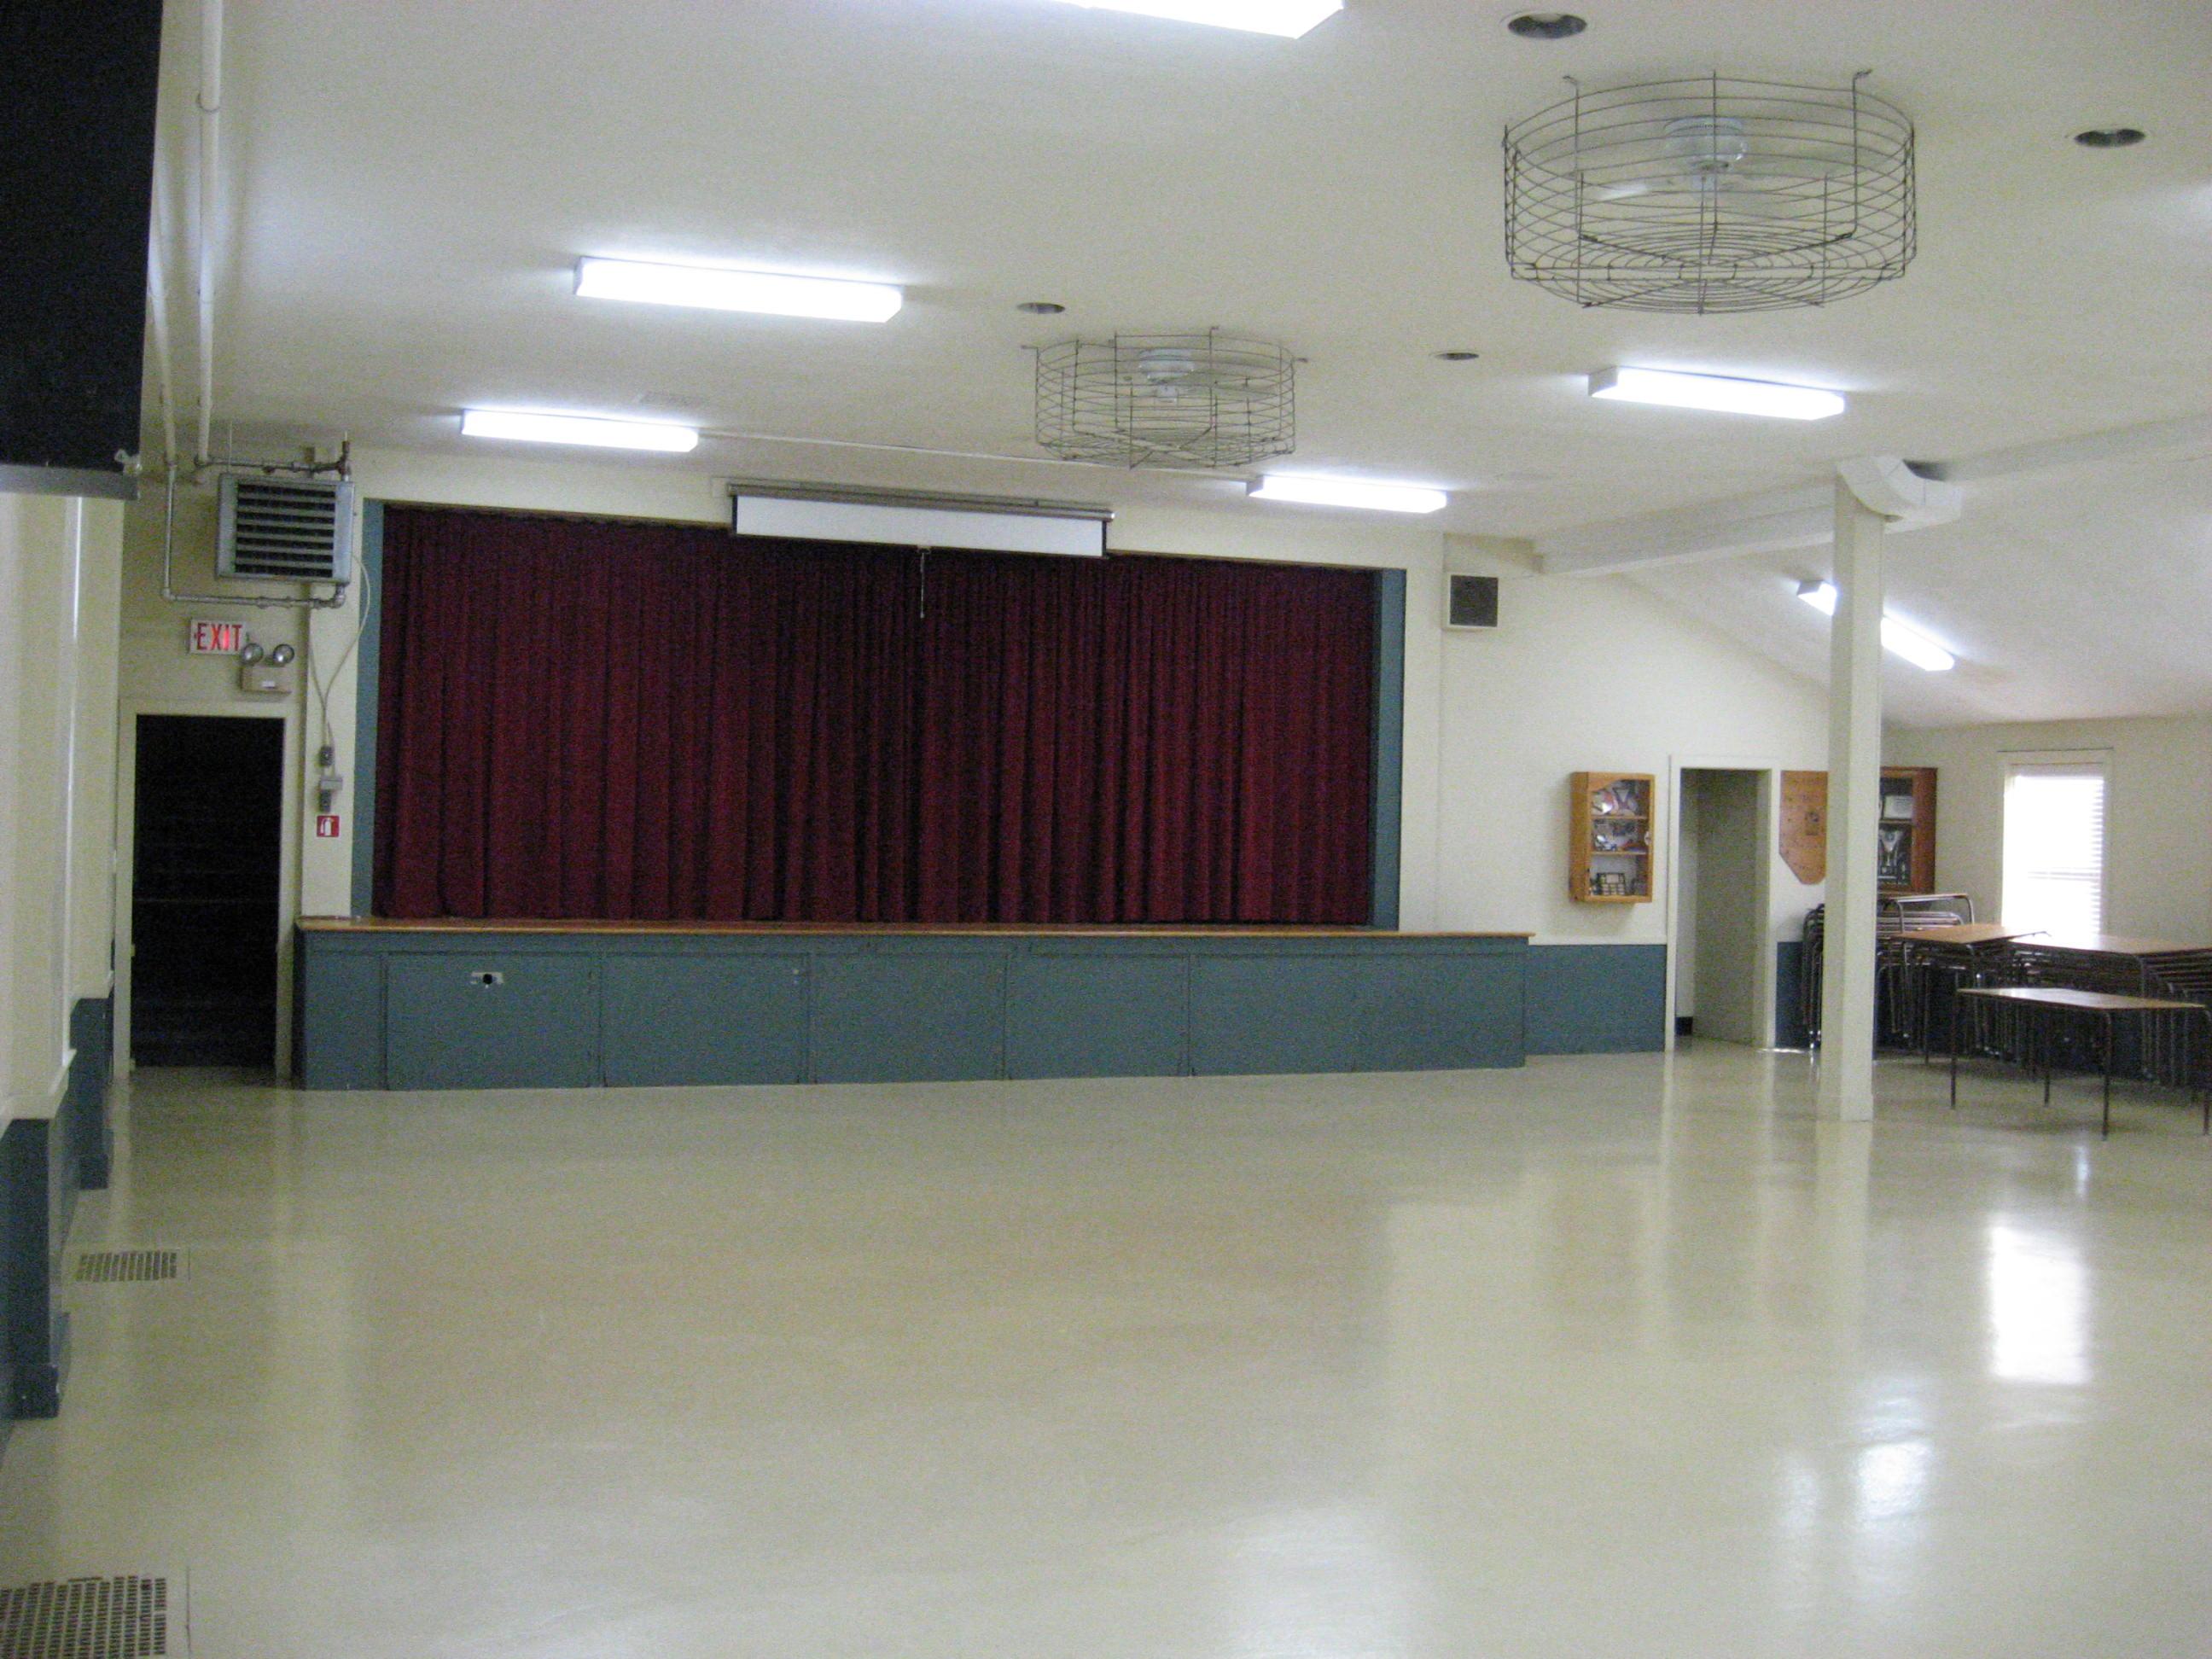 Parish Hall with Stage